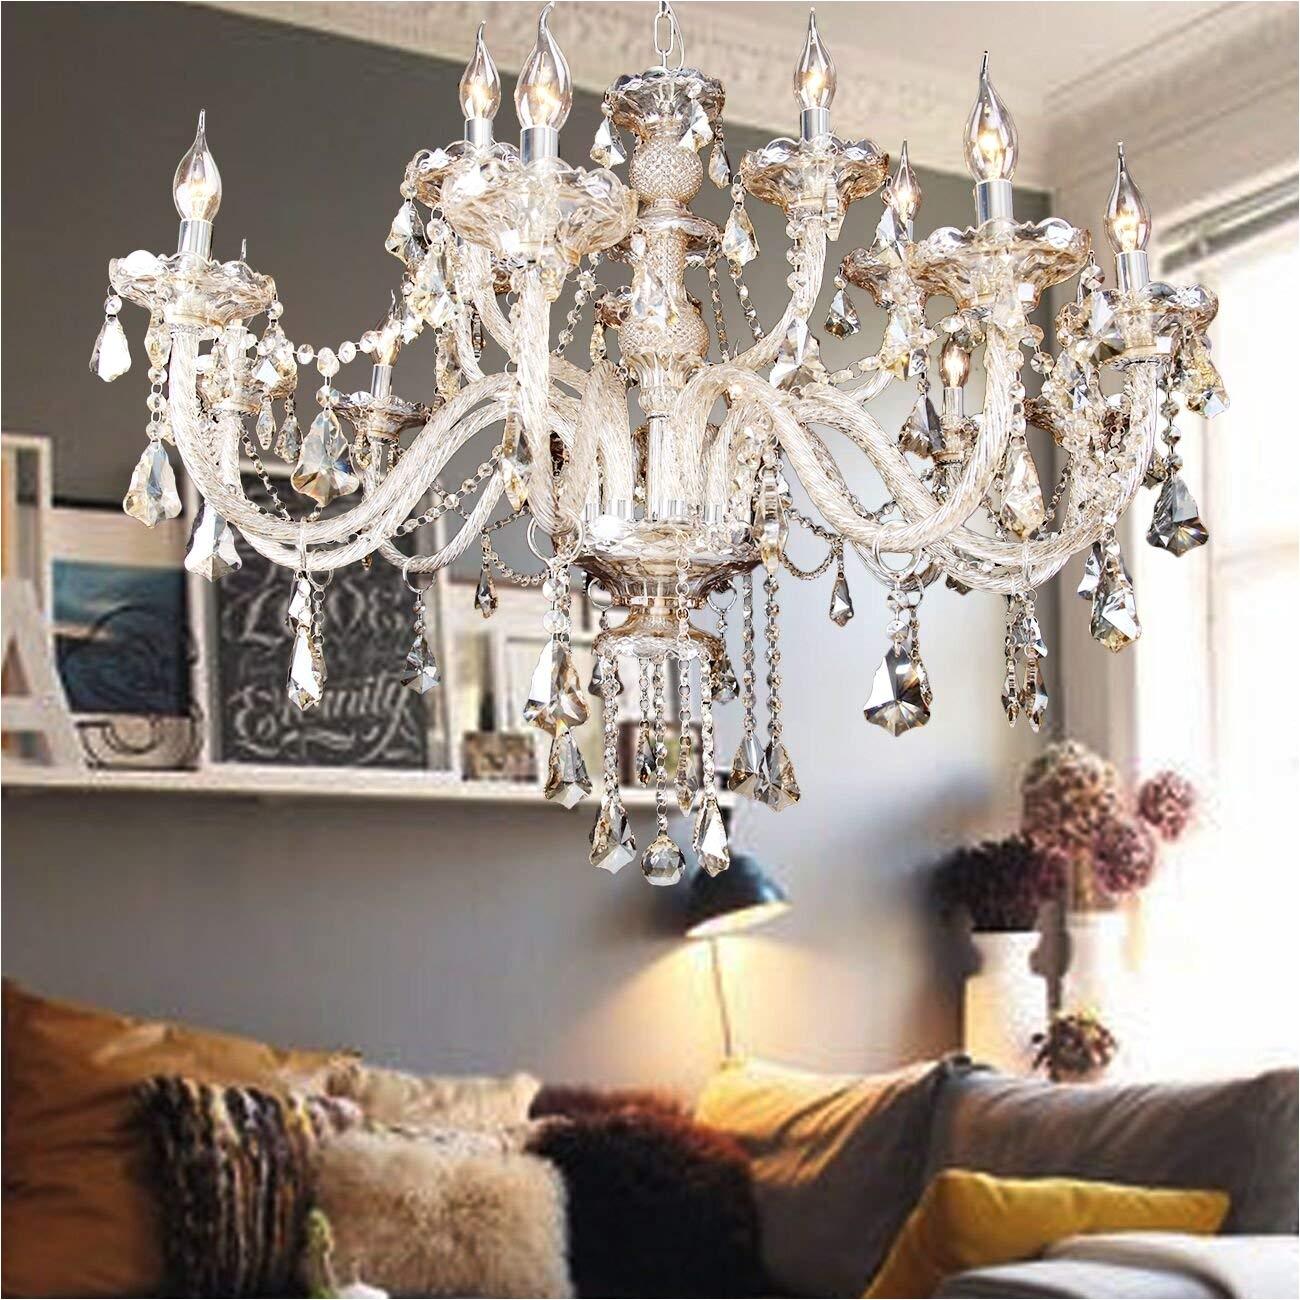 ridgeyard 15 lights luxurious k9 crystal chandelier candle cognac pendant lamp ceiling lighting for dining living room bedroom hallway entry 15 lights